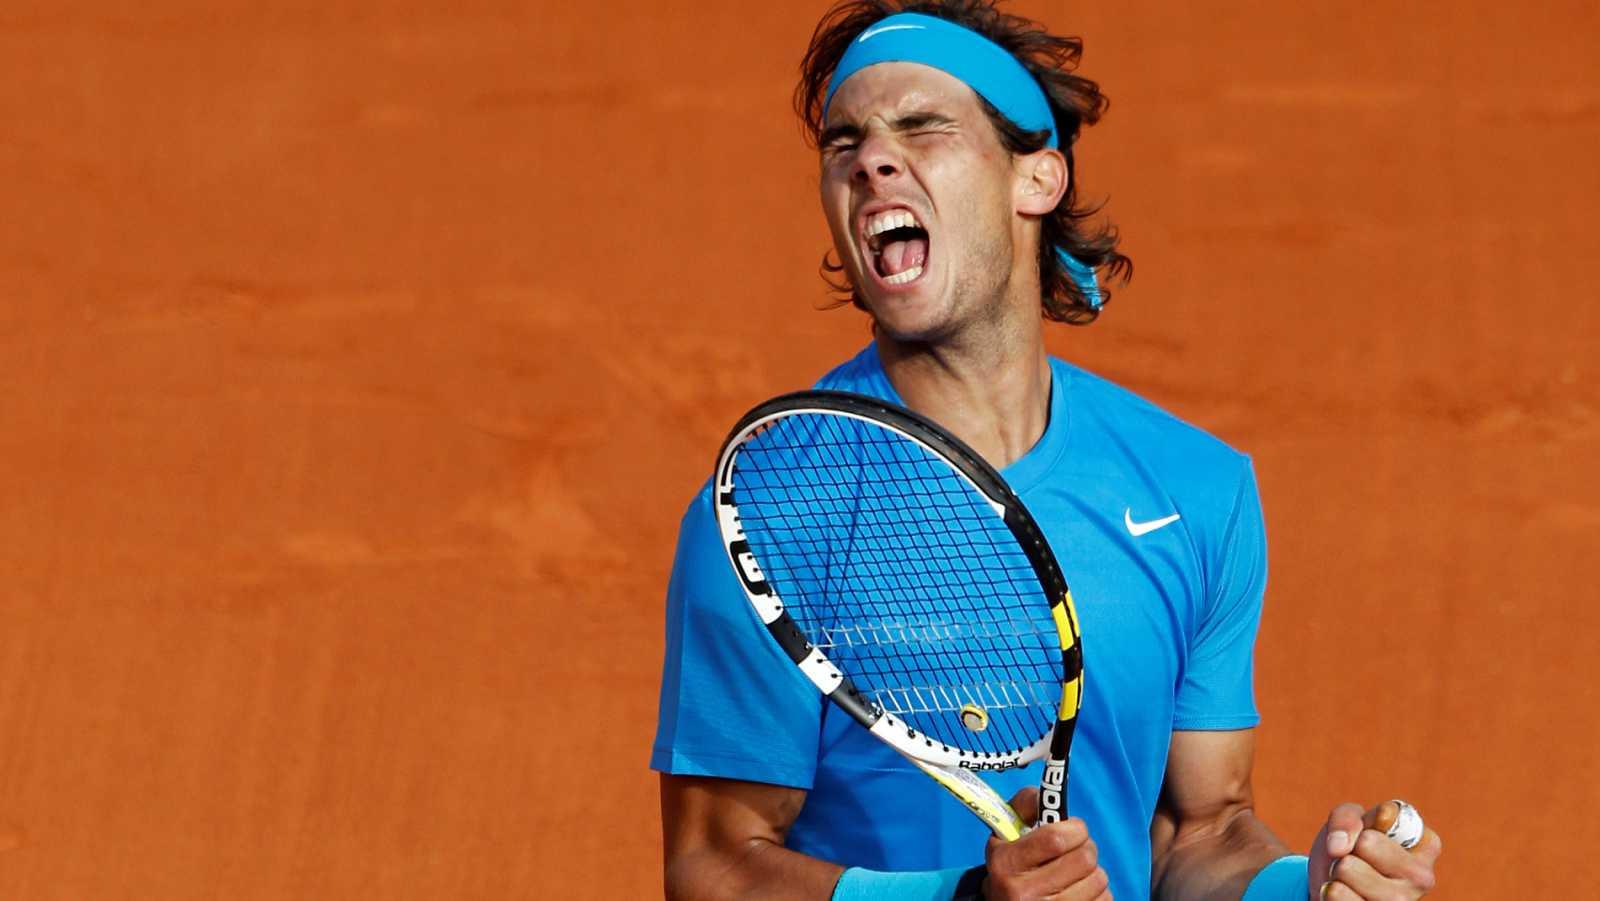 Vídeo: Este fin de semana debería haber empezado Roland Garros